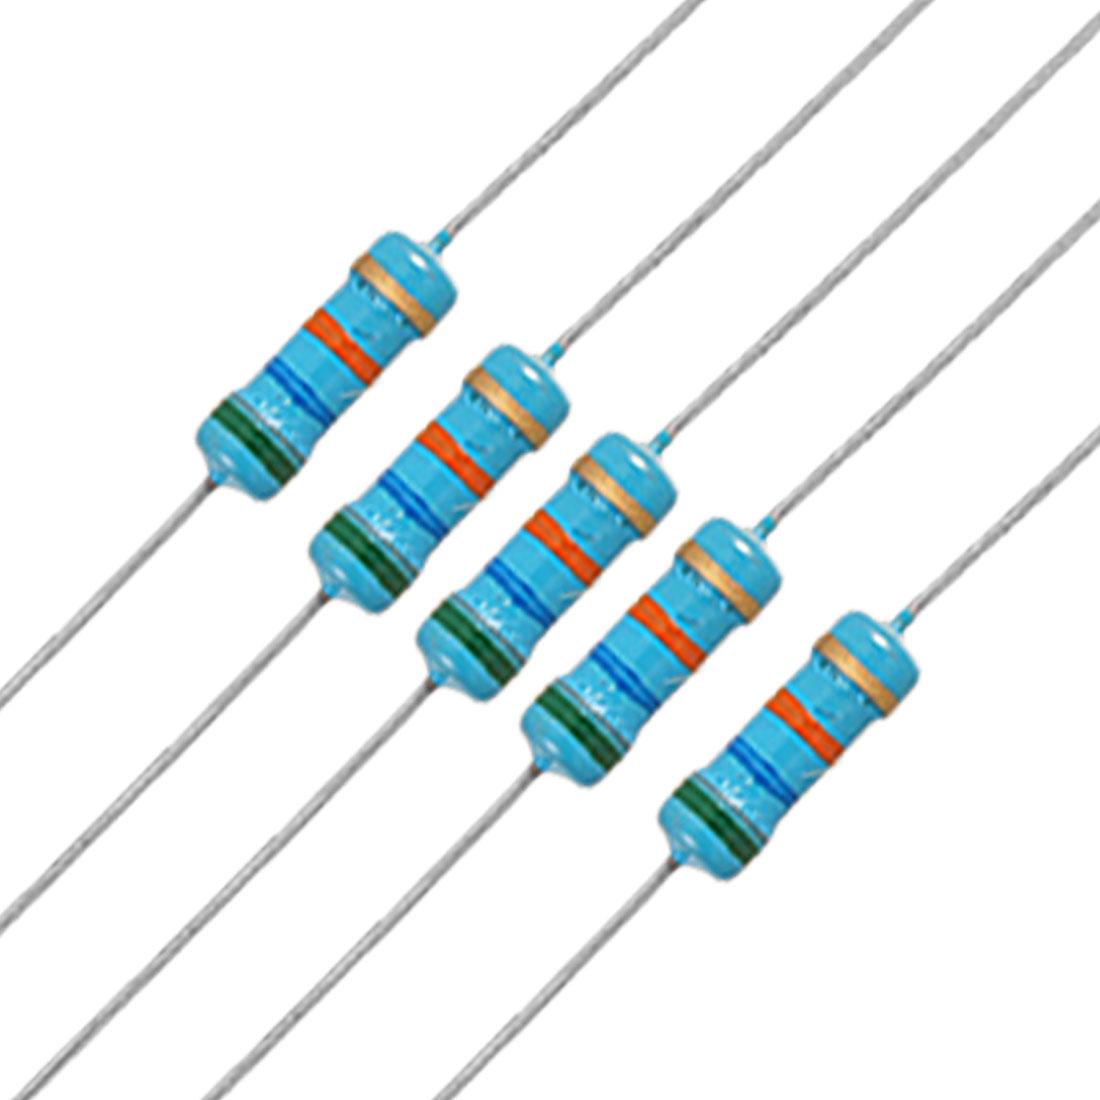 20 x 1/2W Watt 56K ohm 56KR Carbon Film Resistor 0.5W